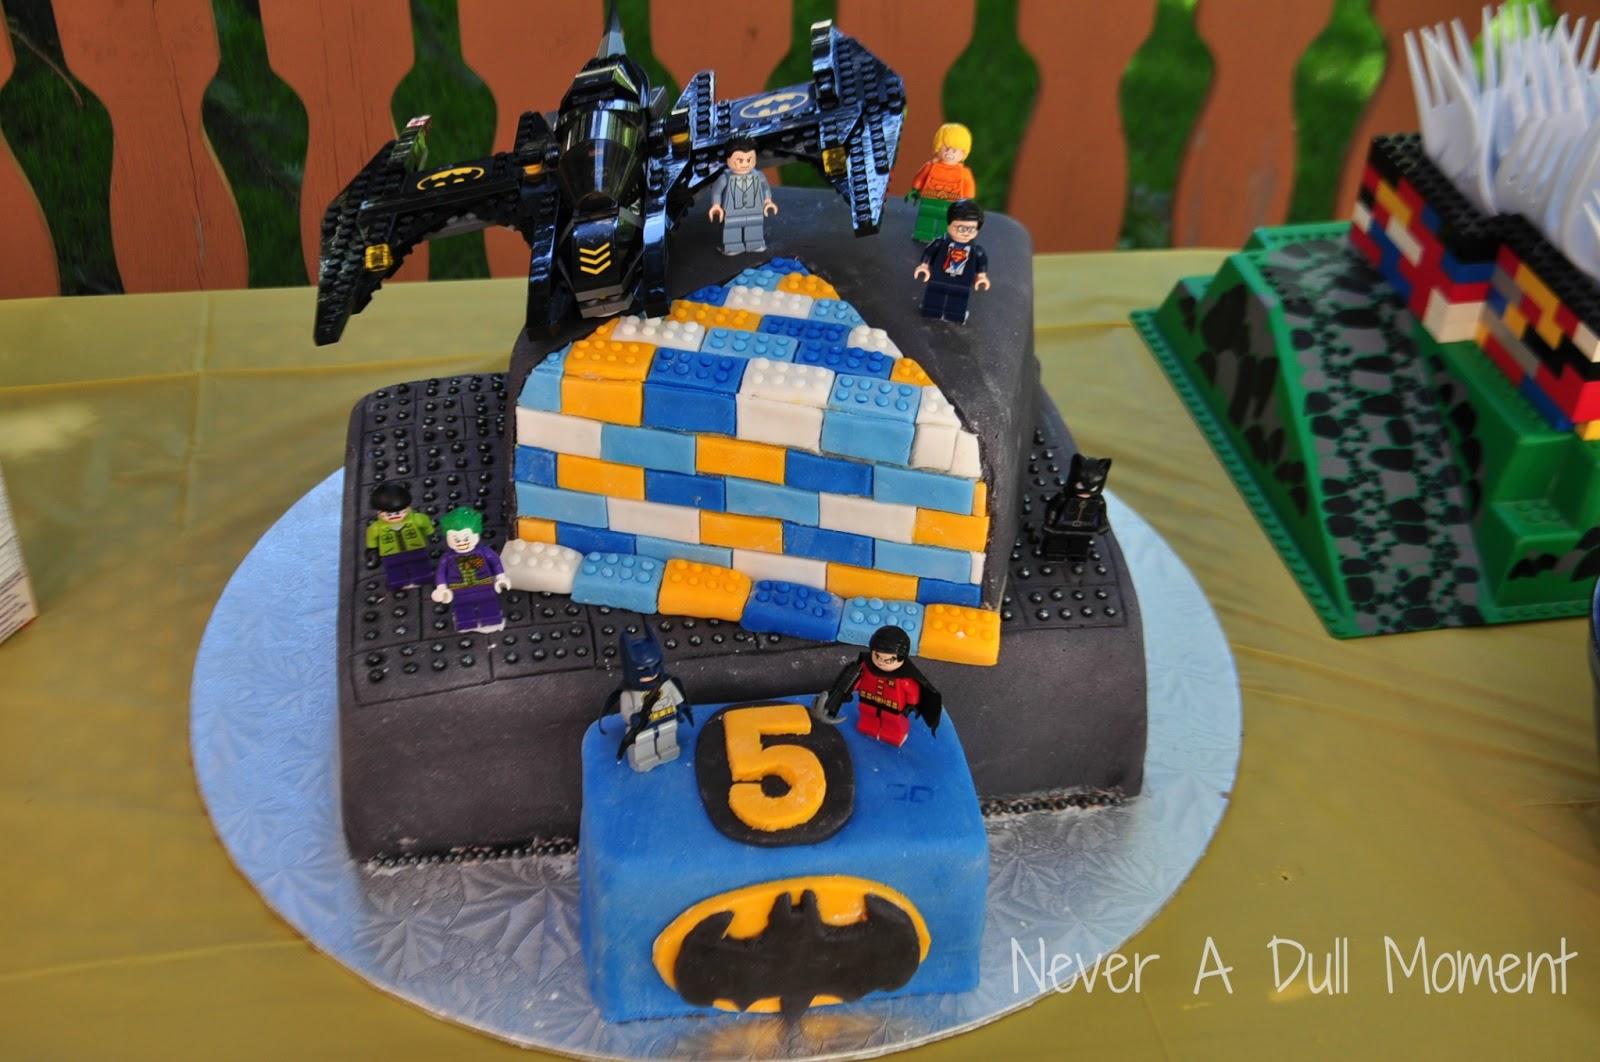 Birthday Cake Ideas Lego : Never A Dull Moment: Lego Batman Birthday Cake